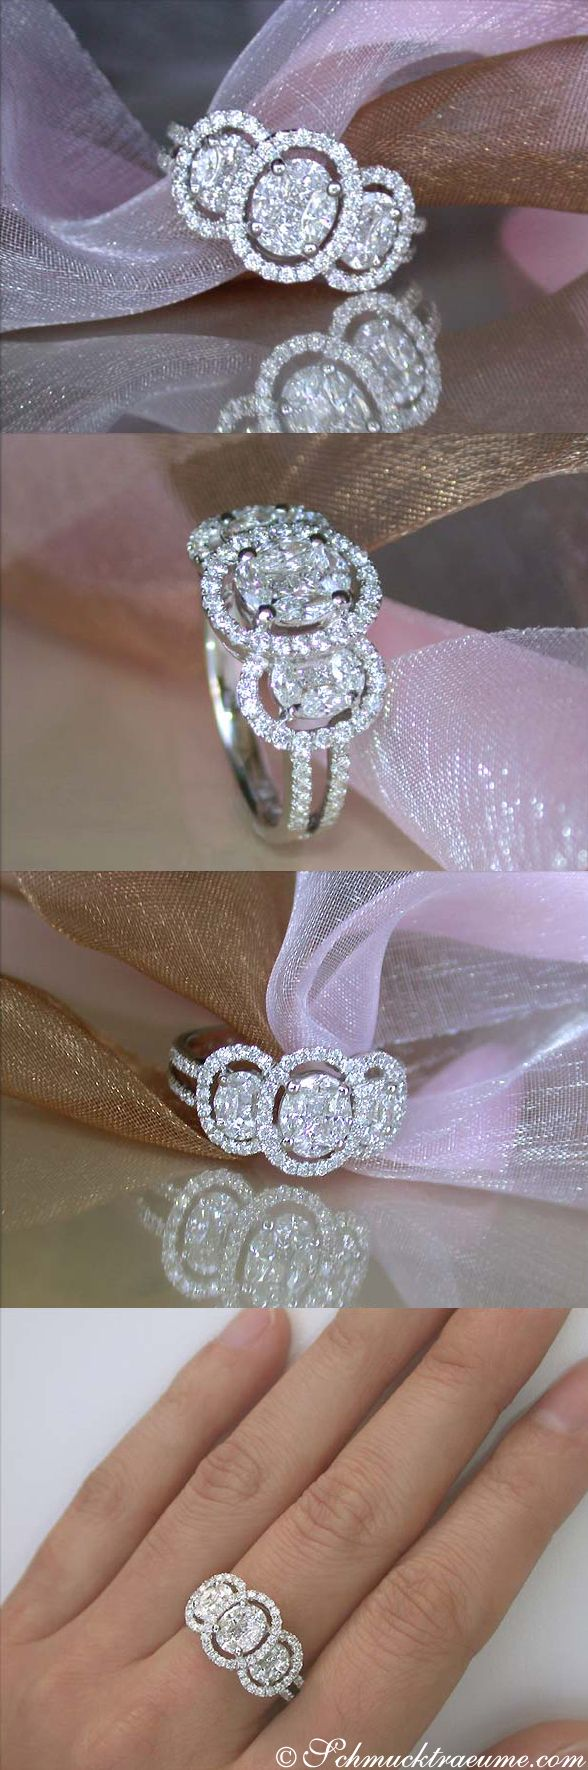 Pretty Diamond Ring, 1,14 ct. GSI/VS, WG18K Visit